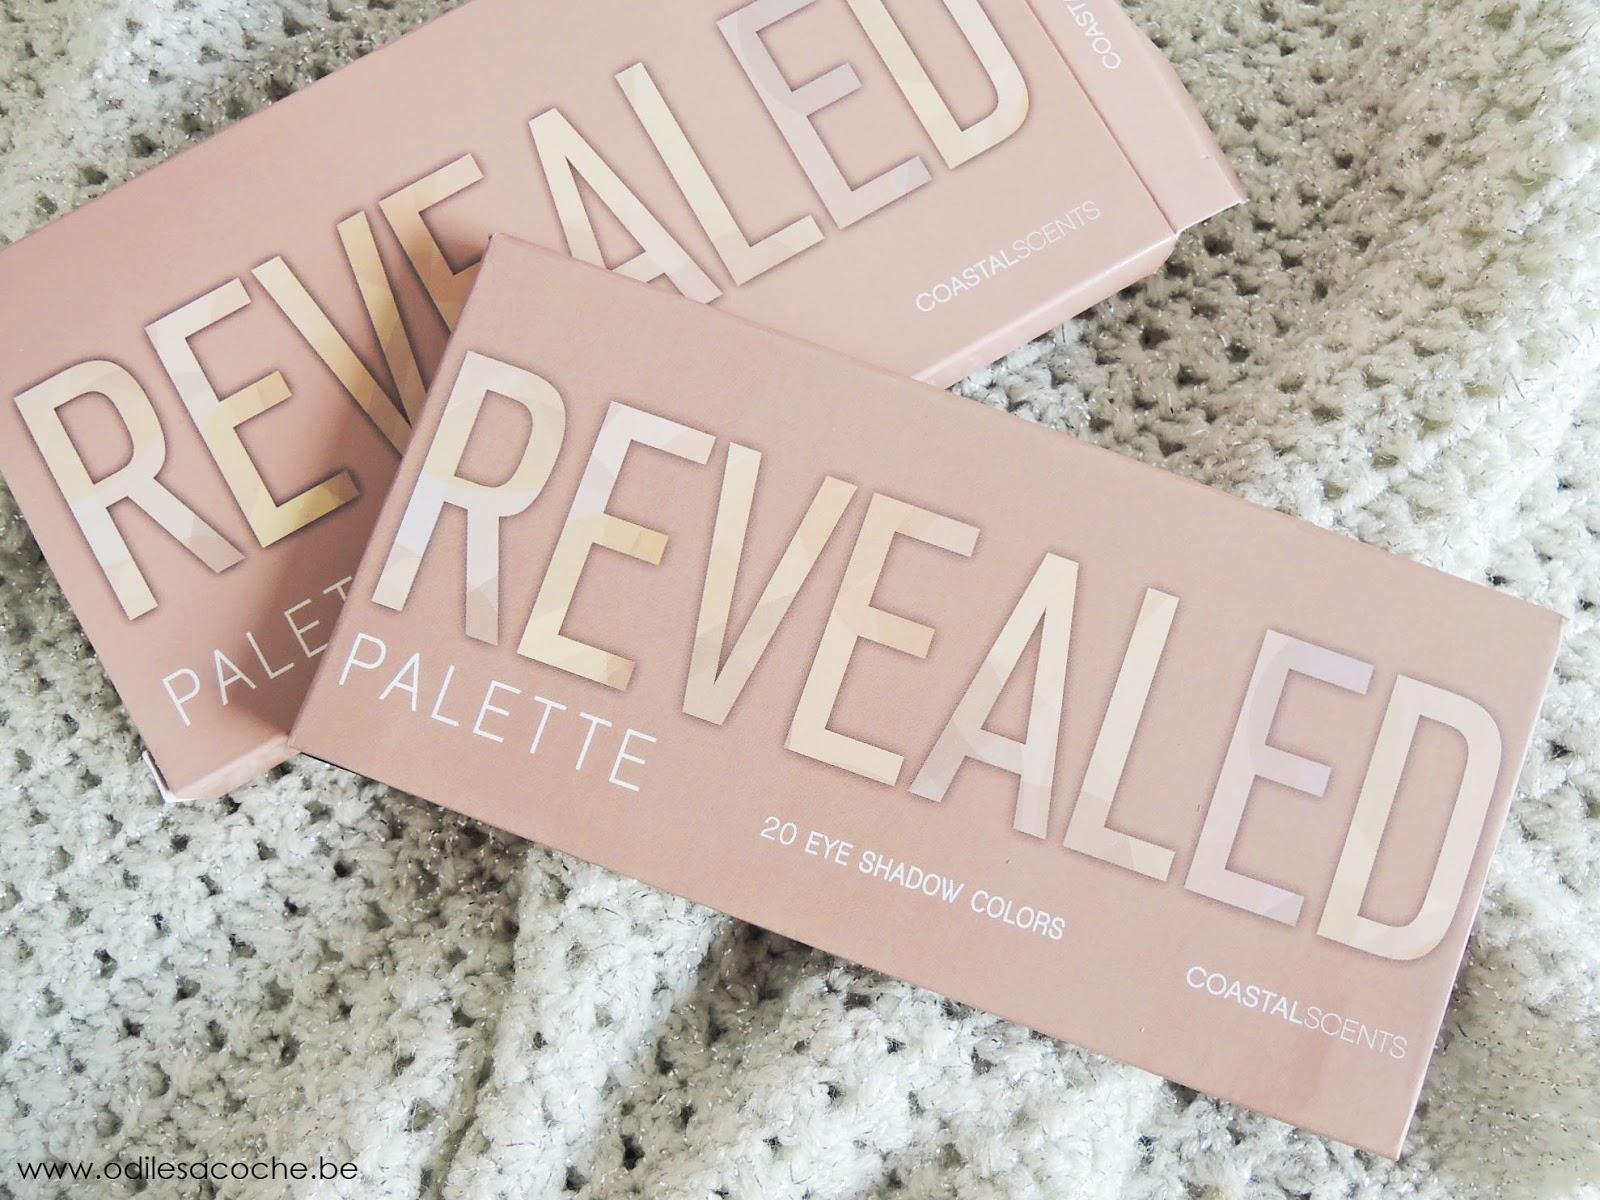 Packaging de Revealed palette